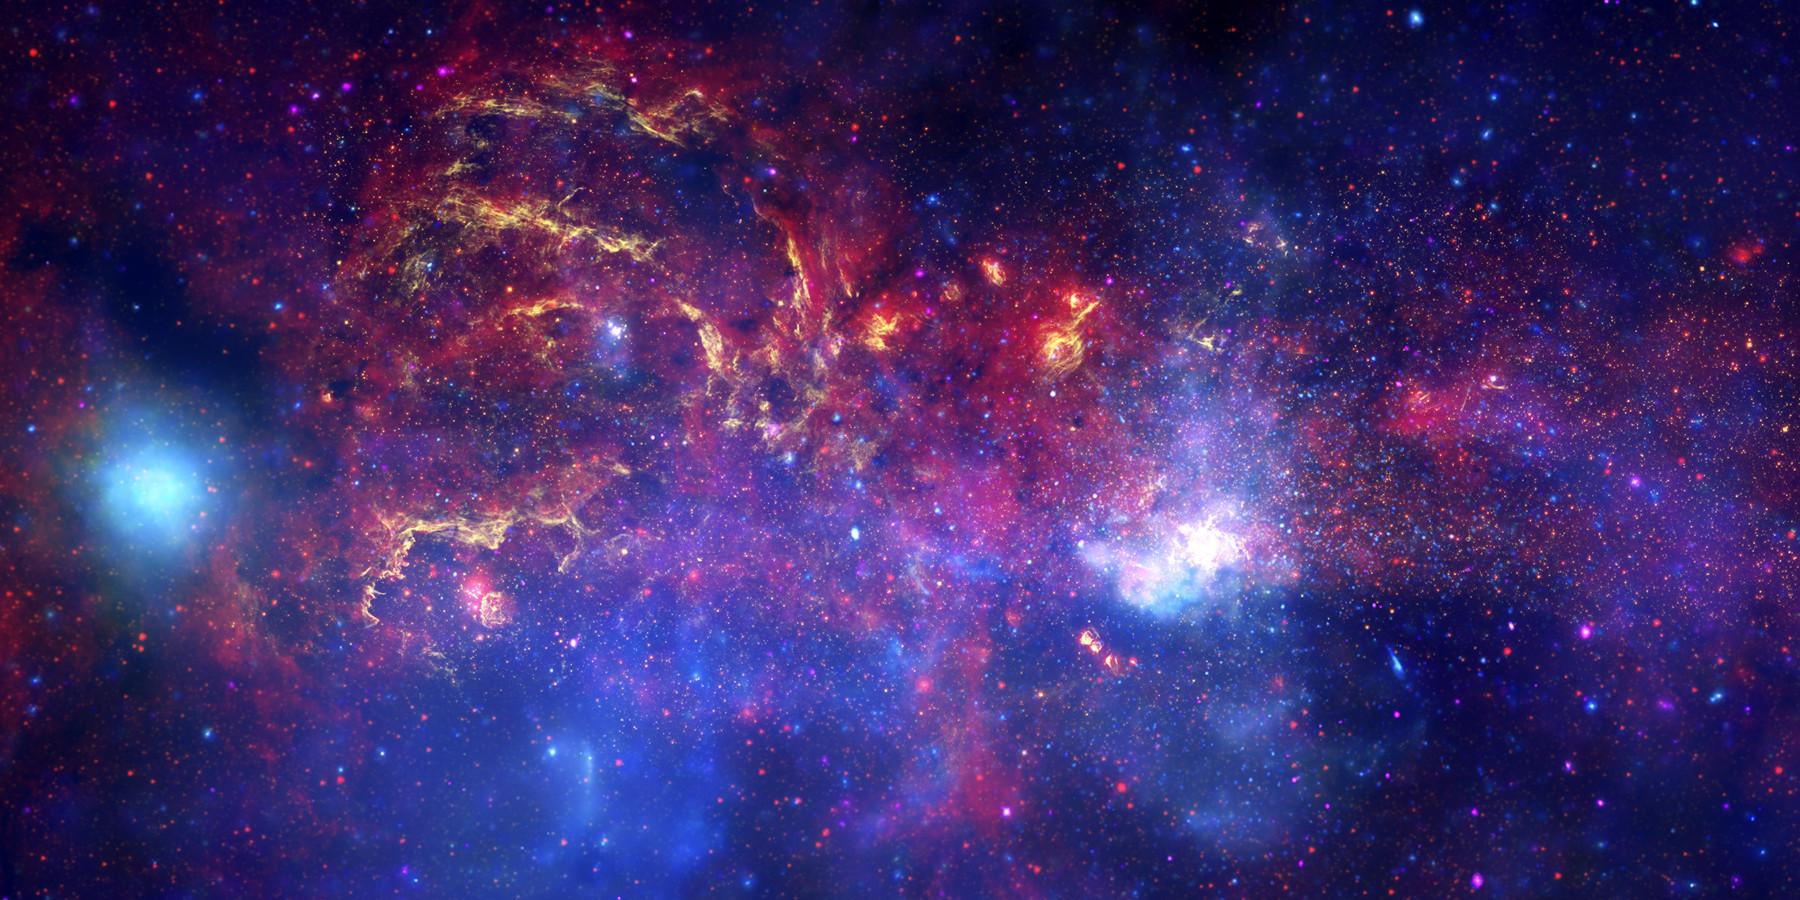 Hubble_telescope_2009_28-b_emzmpk